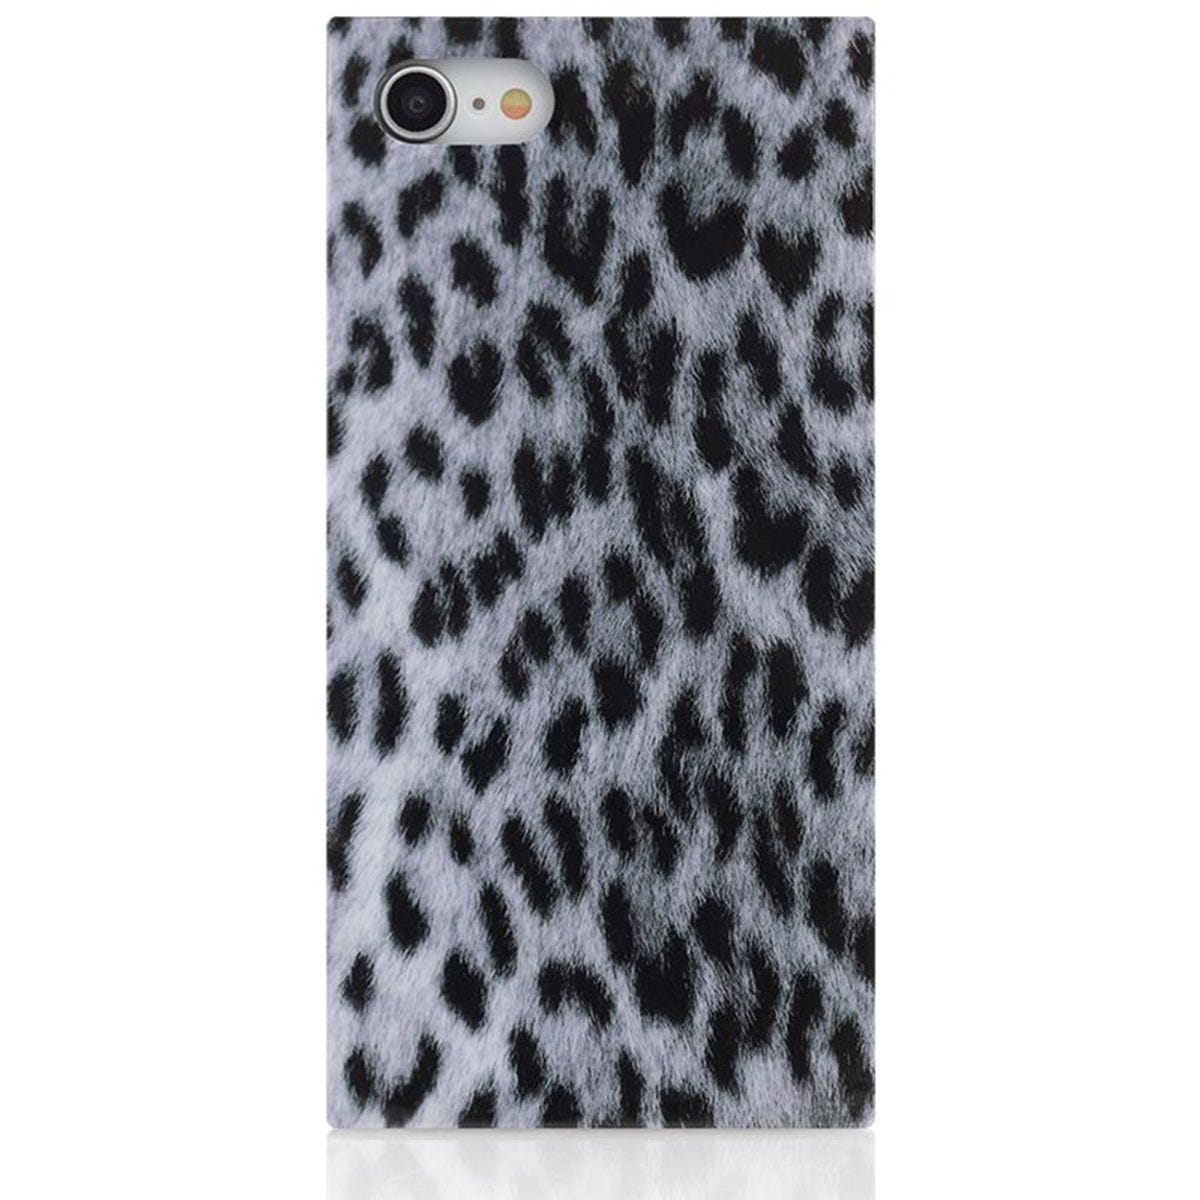 iDecoz Snow Leopard Phone Case iPhone 7/8